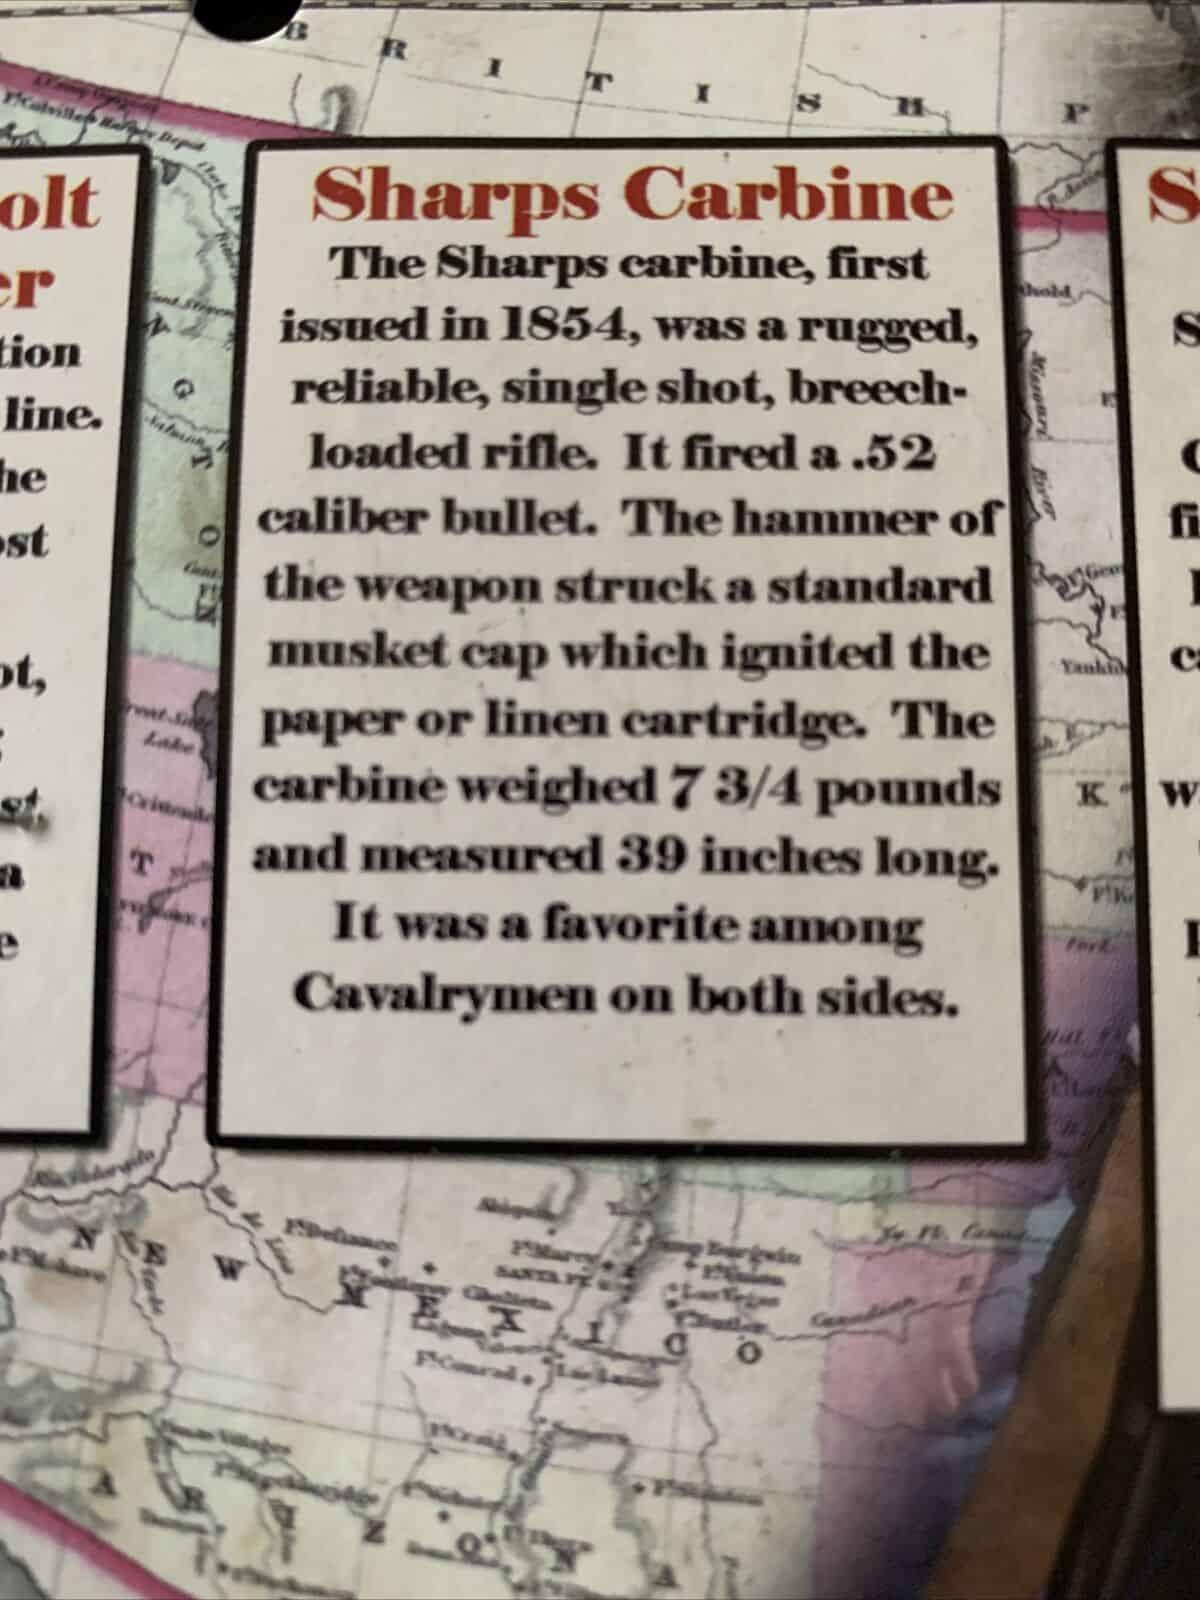 Civil War Firearms - Replicas